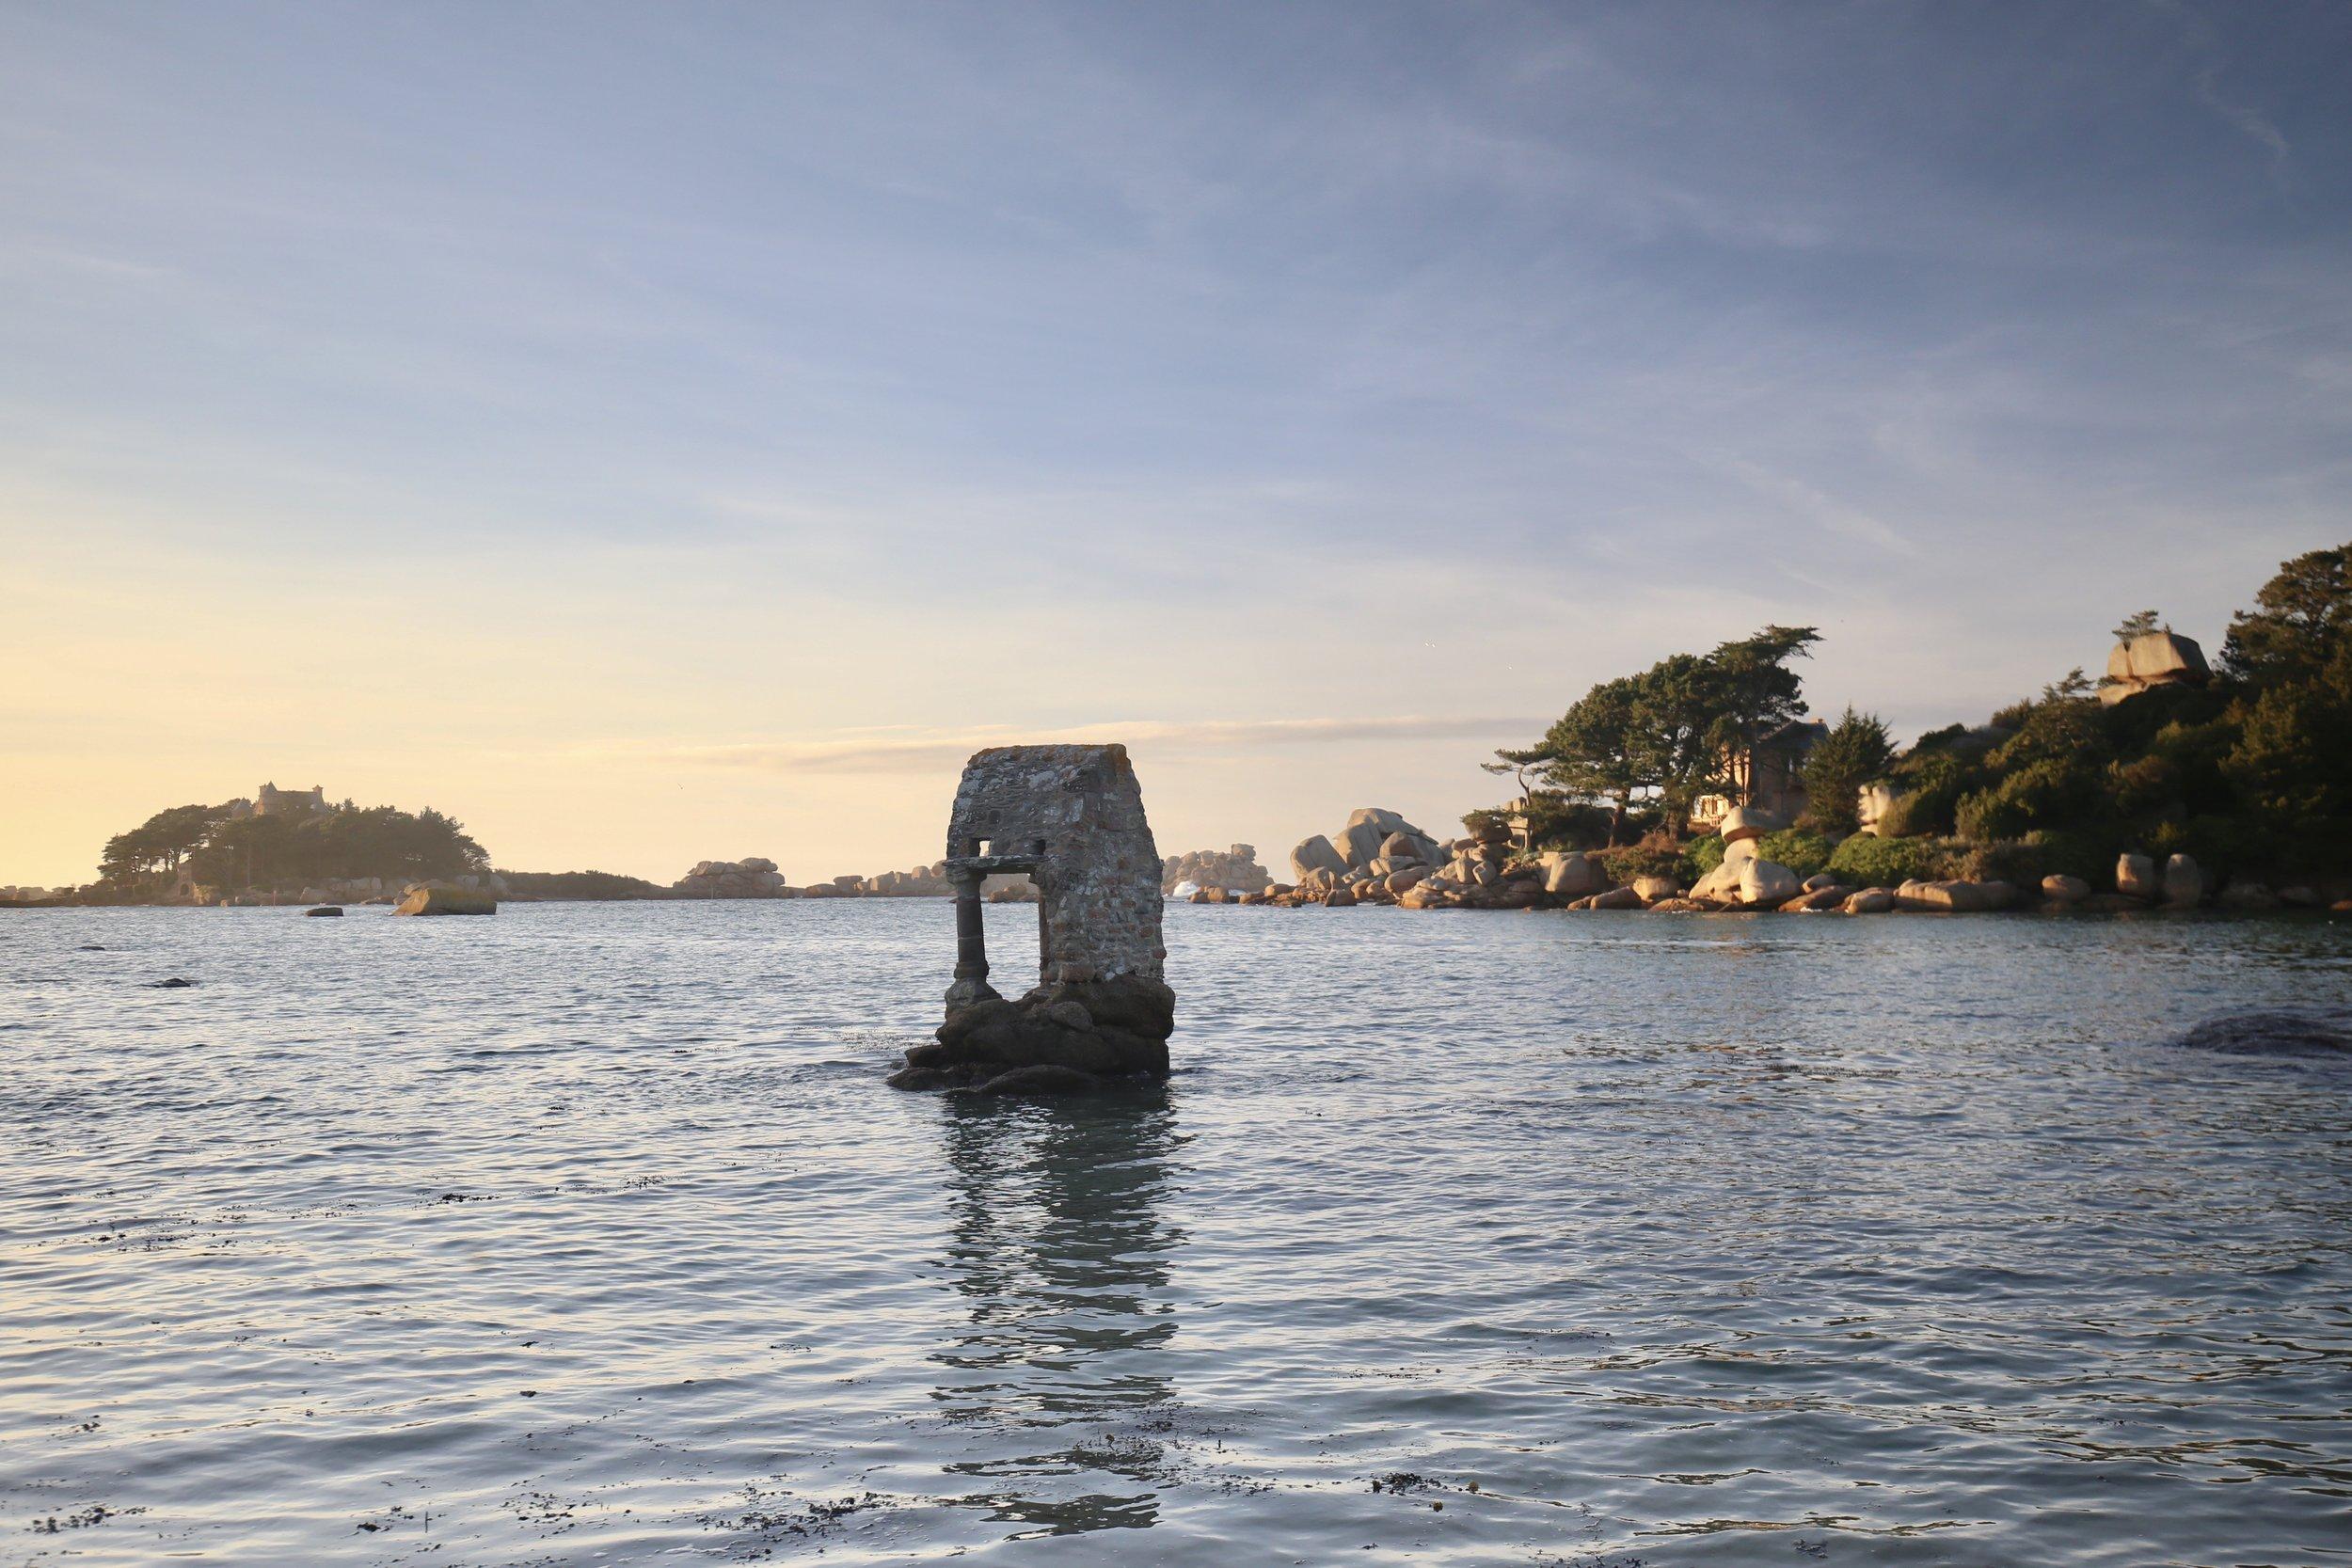 Shrine in the waters - a stone sea shrine.